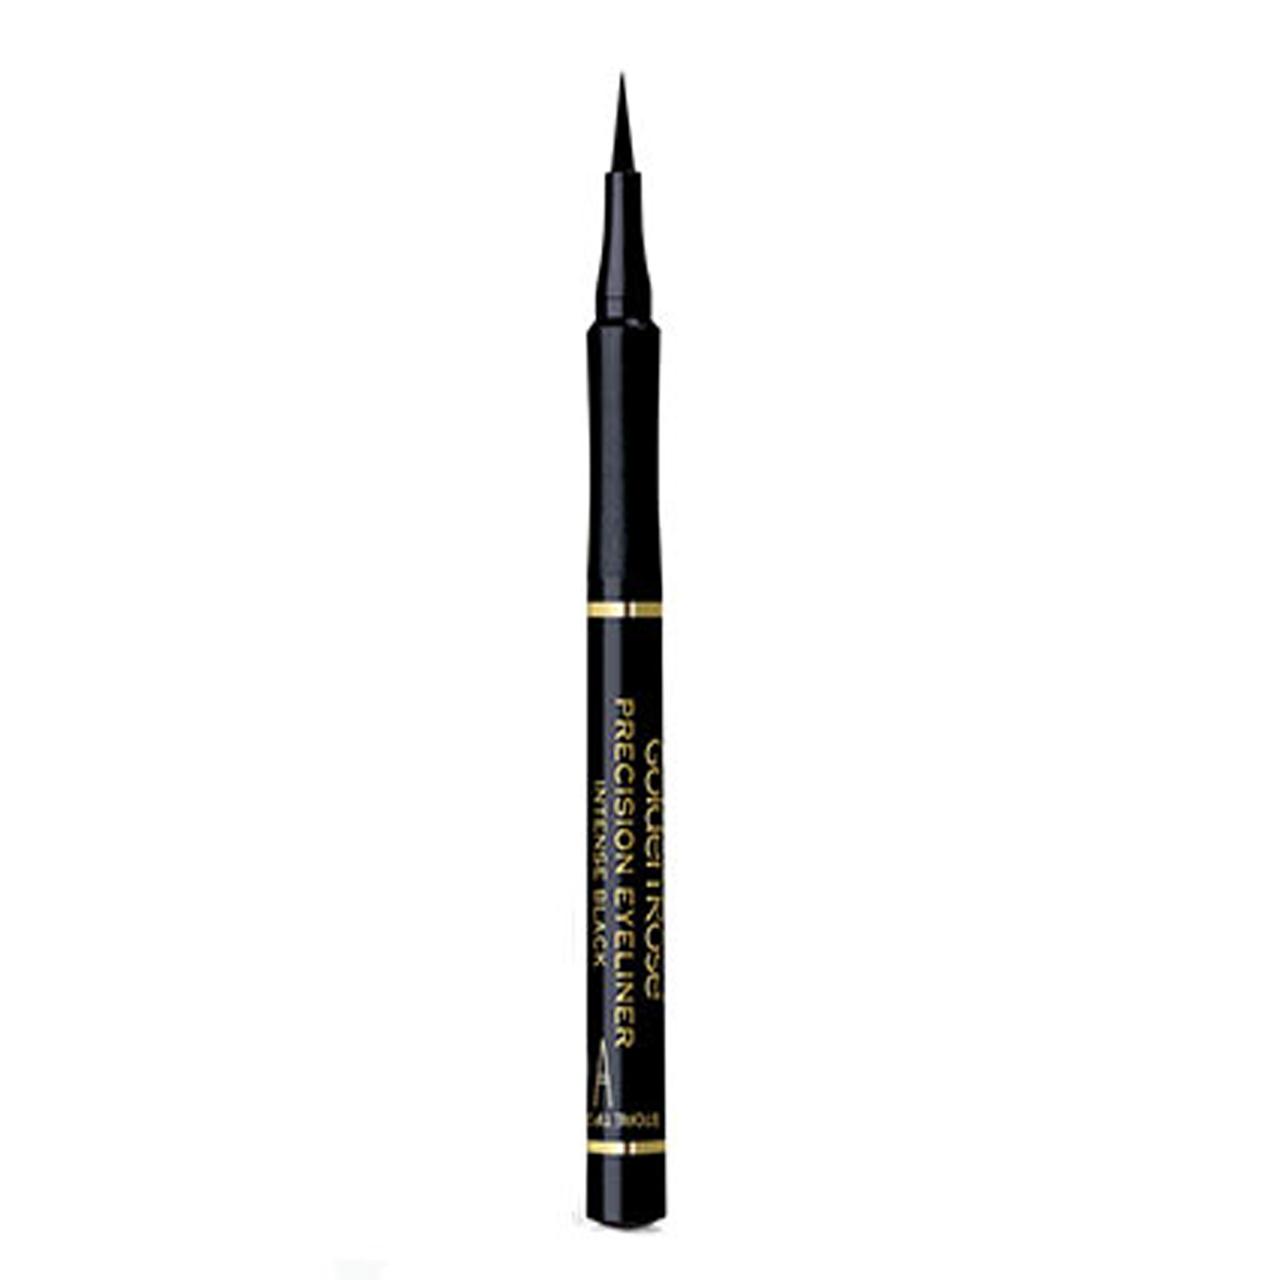 خط چشم گلدن رز مدل Precision Eyeliner